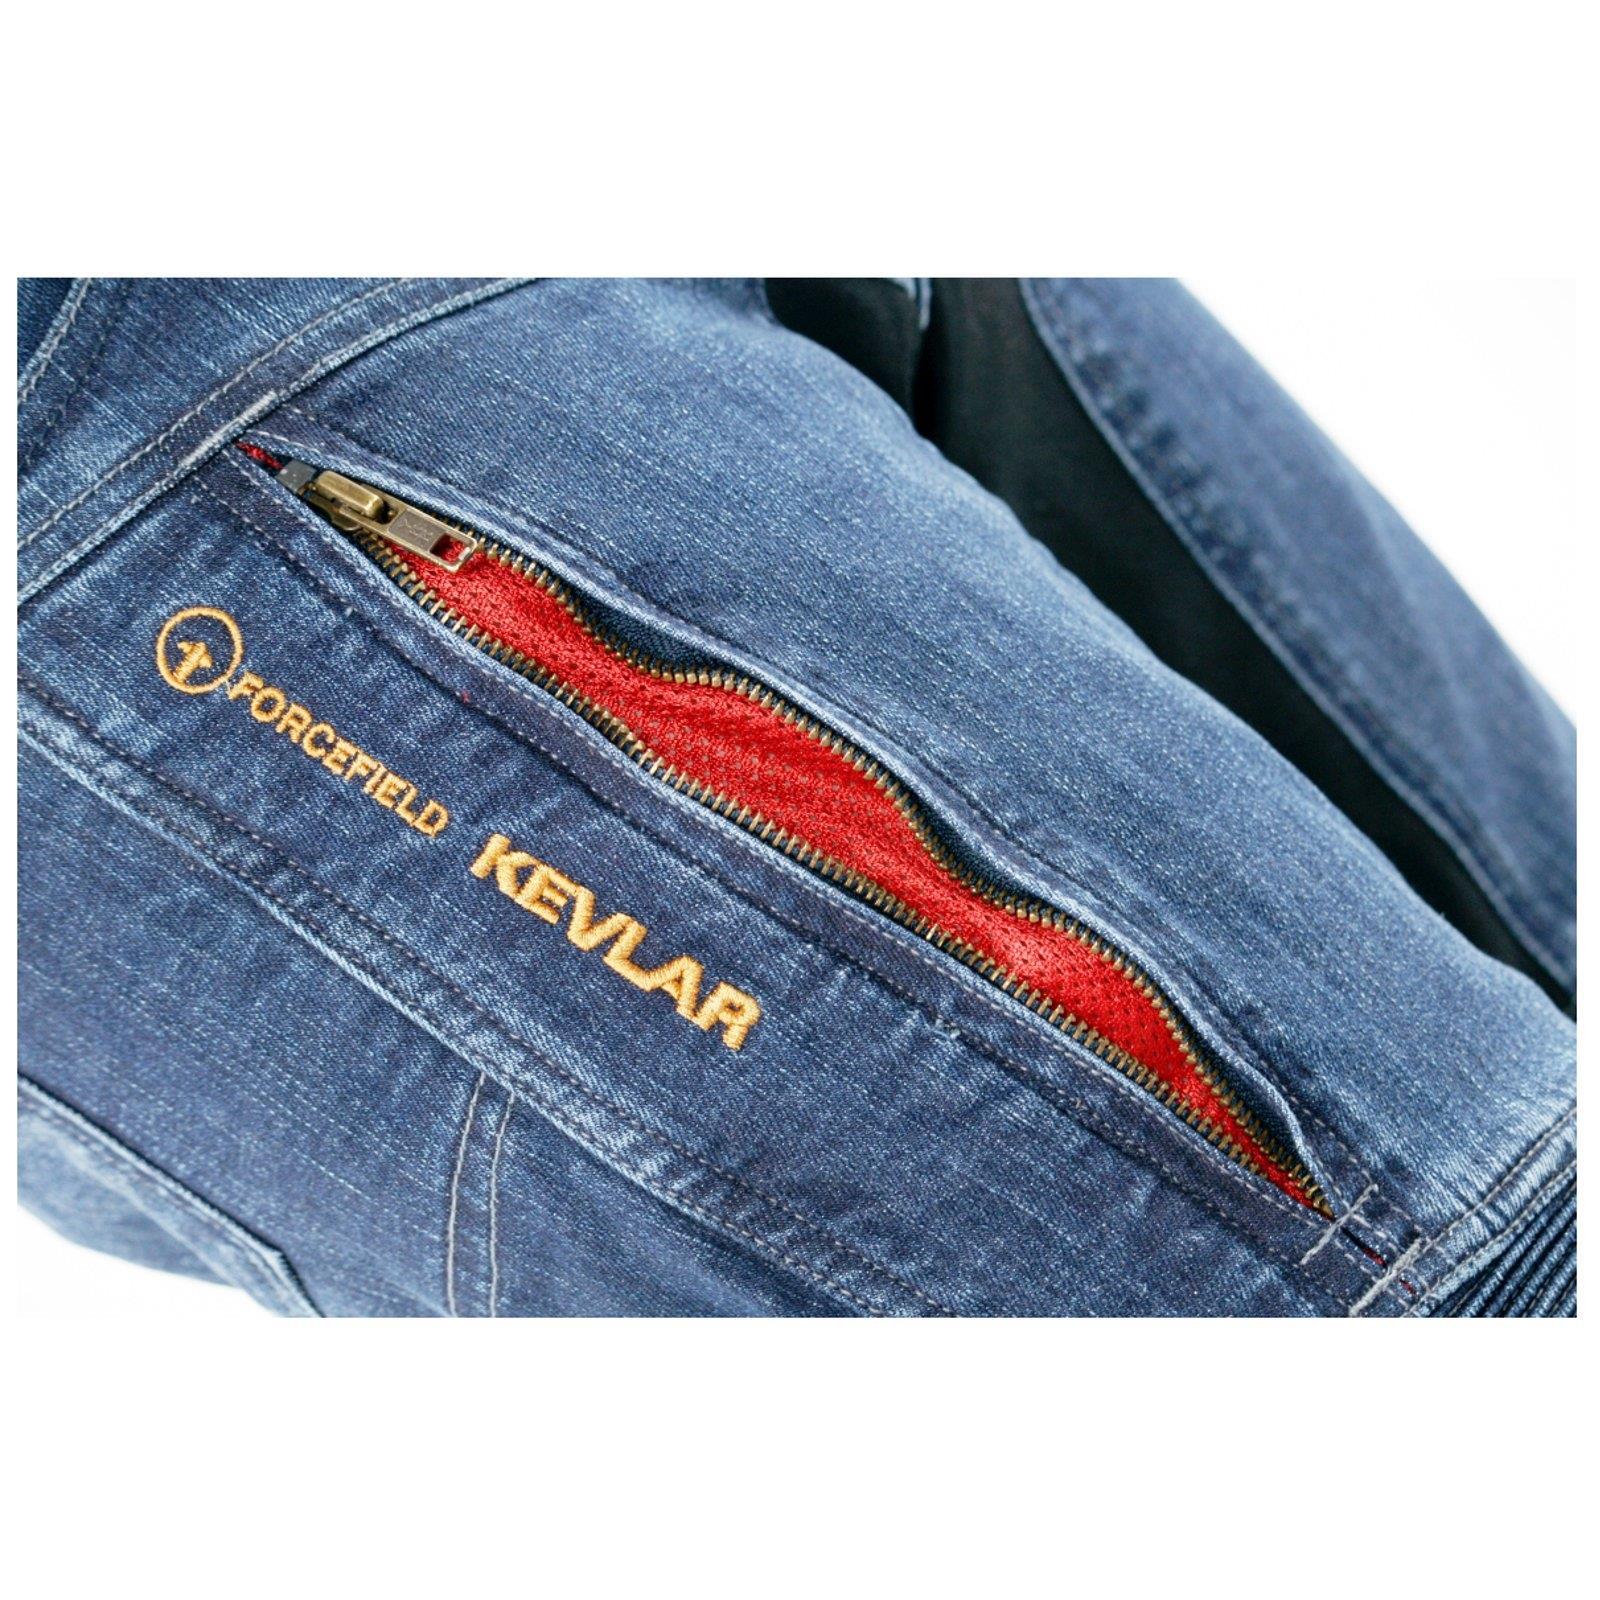 Trilobite-Pantaloni-Moto-Jeans-Abbigliamento-Parado-MICAS-URBAN-DUAL-PANTS-ACID miniatura 70